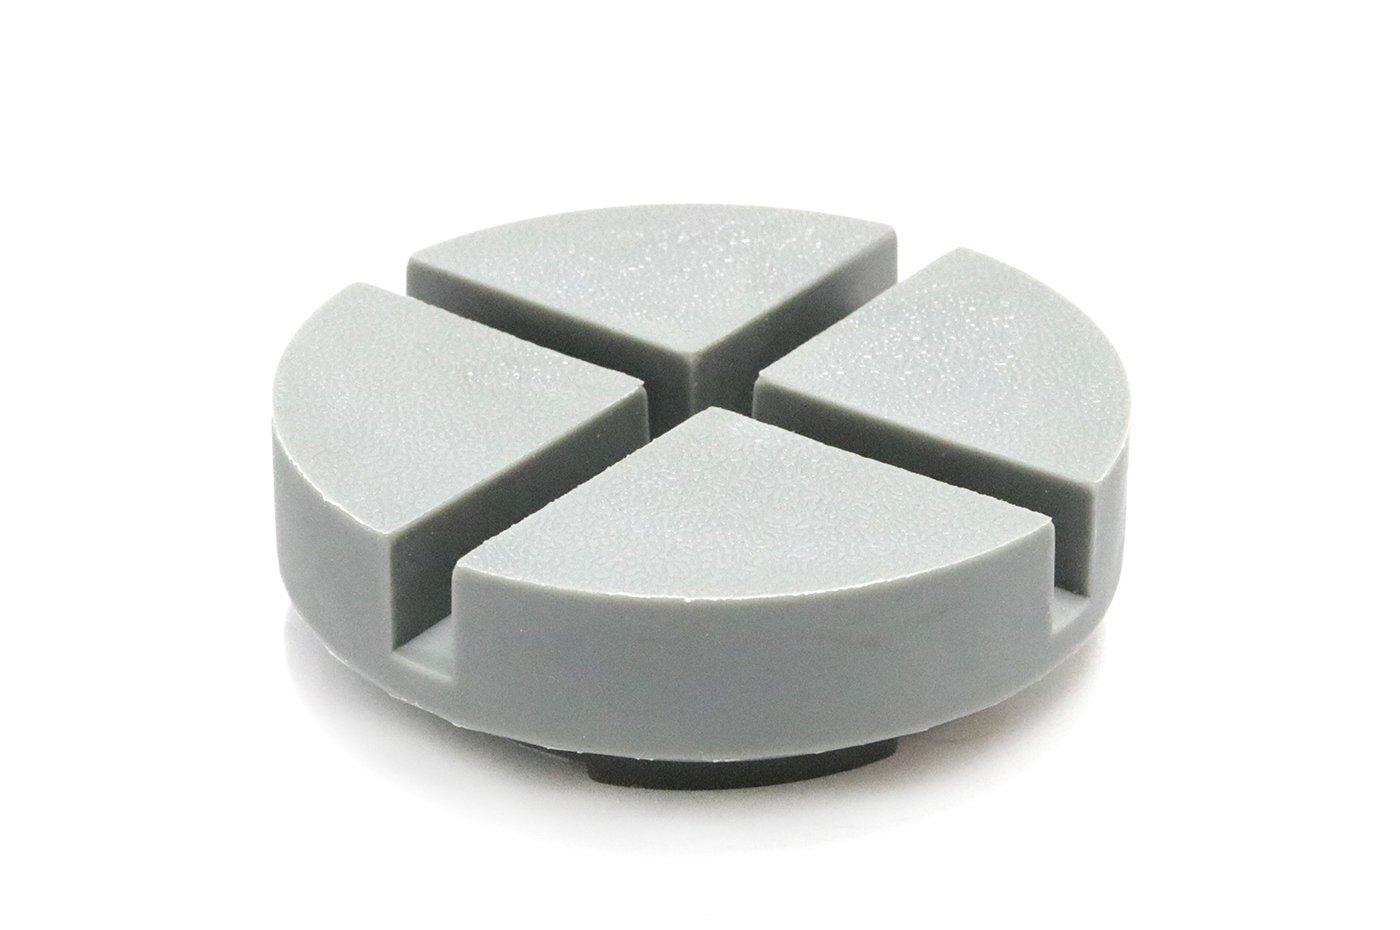 Single Extra Large Universal Polyurethane Floor Jack Pad Adapter by TMB Motorsports (Image #1)